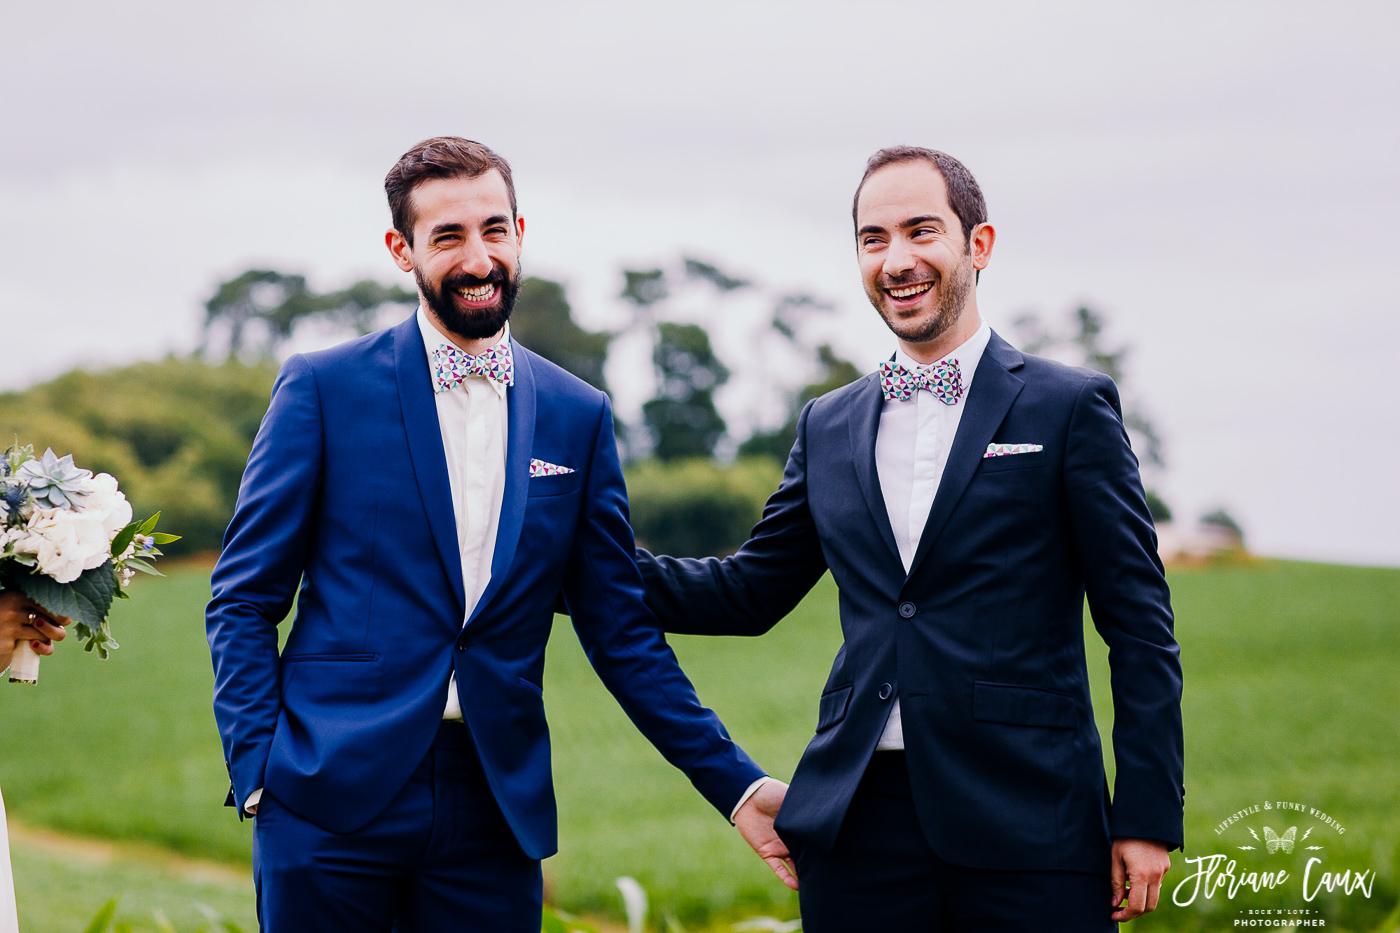 photographe-mariage-pays-basque-Floriane-Caux (30)